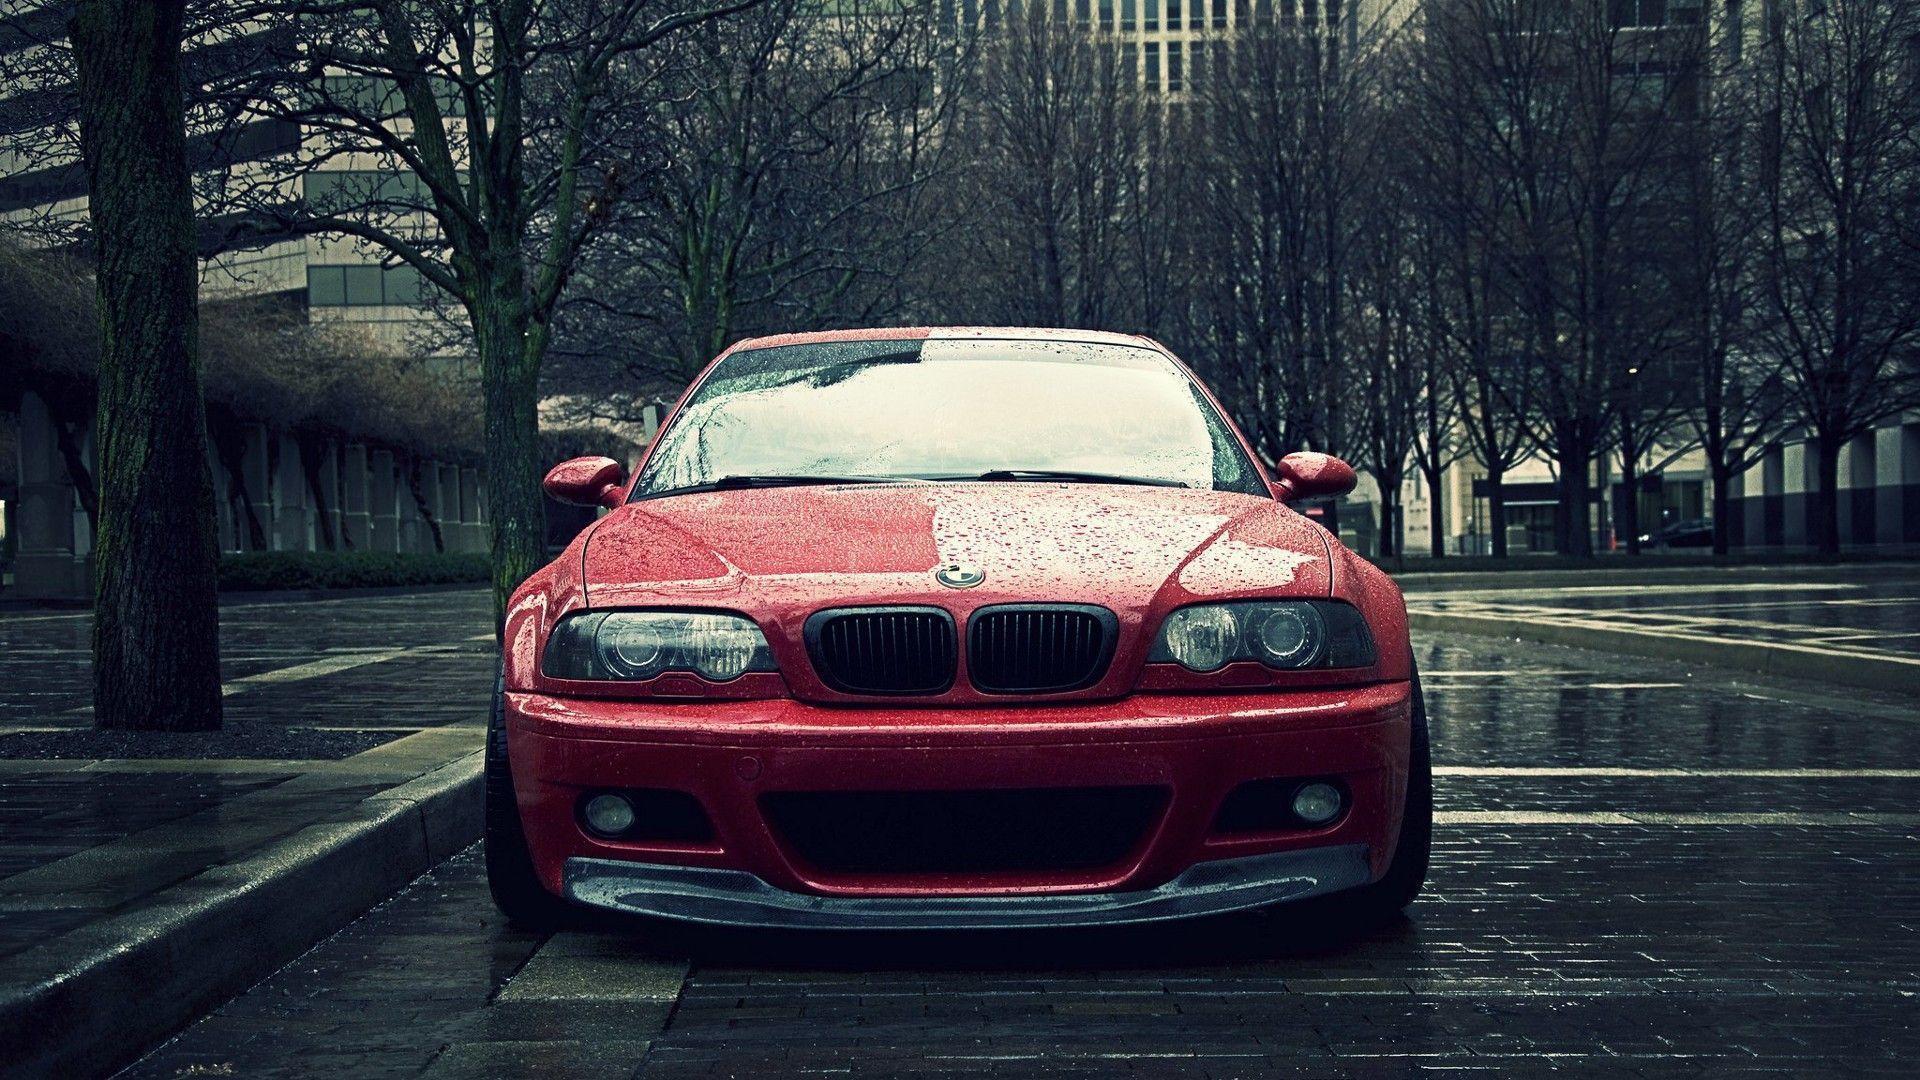 Subaru Brz Turbo >> BMW M3 E46 Wallpapers - Wallpaper Cave